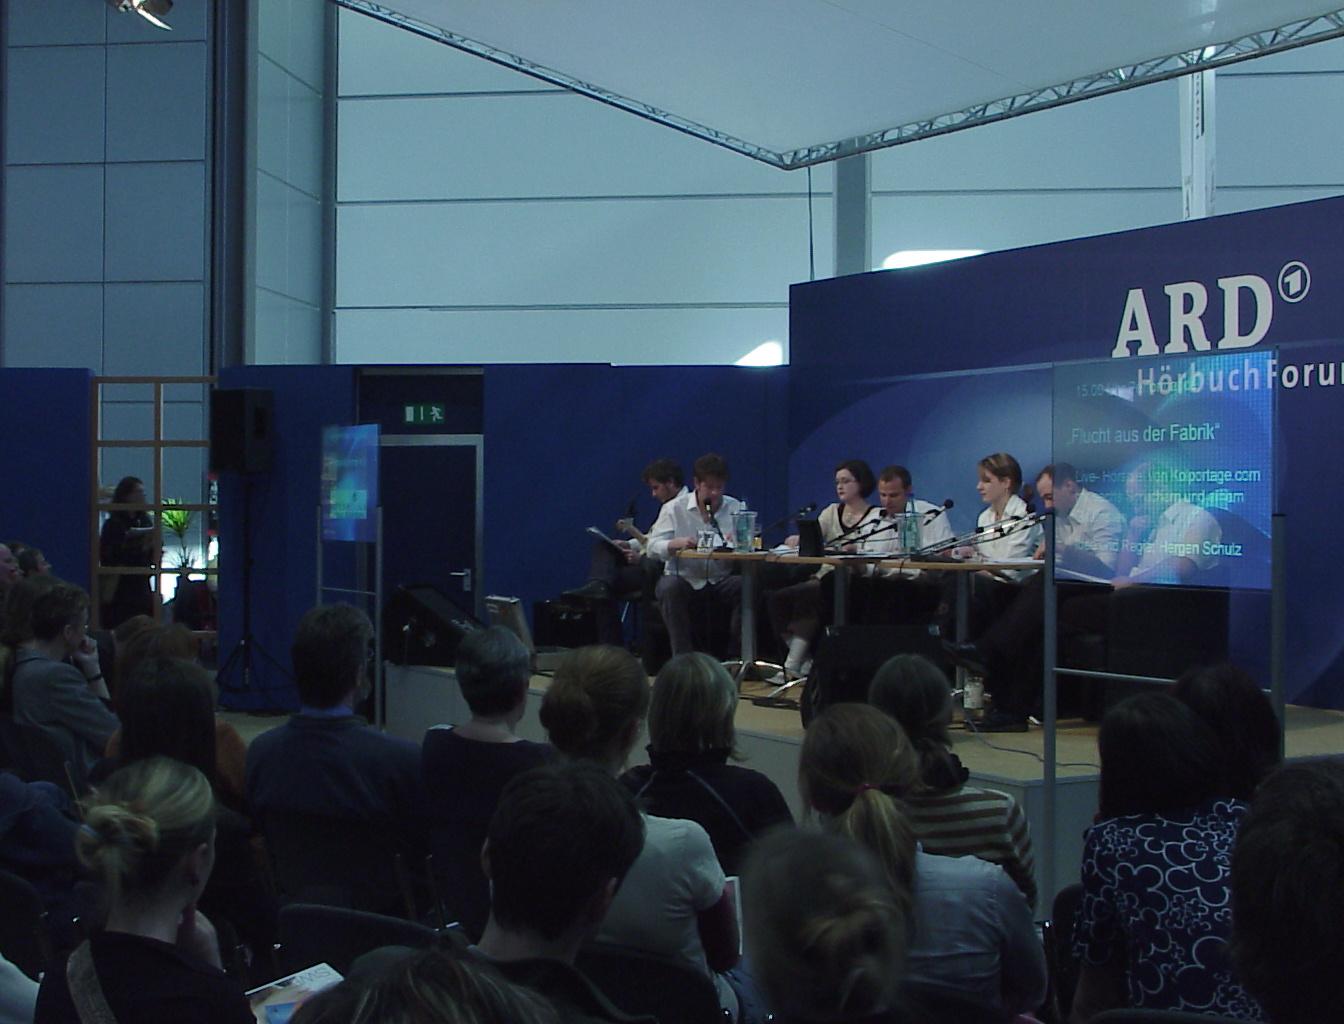 ARD Hörbuchforum Leipzig